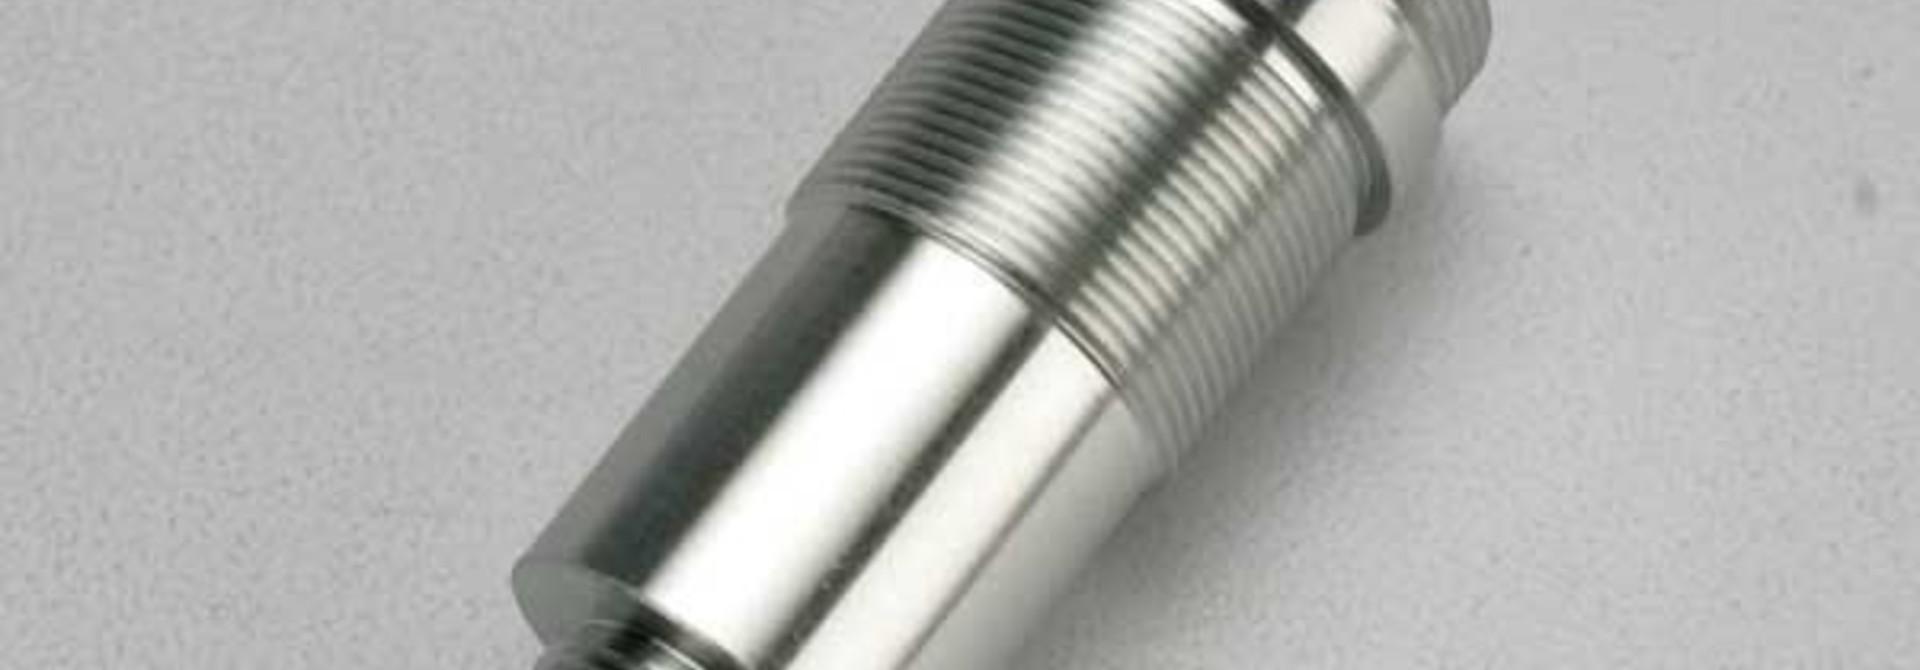 Body, GTR shock (aluminum) (1), TRX5466